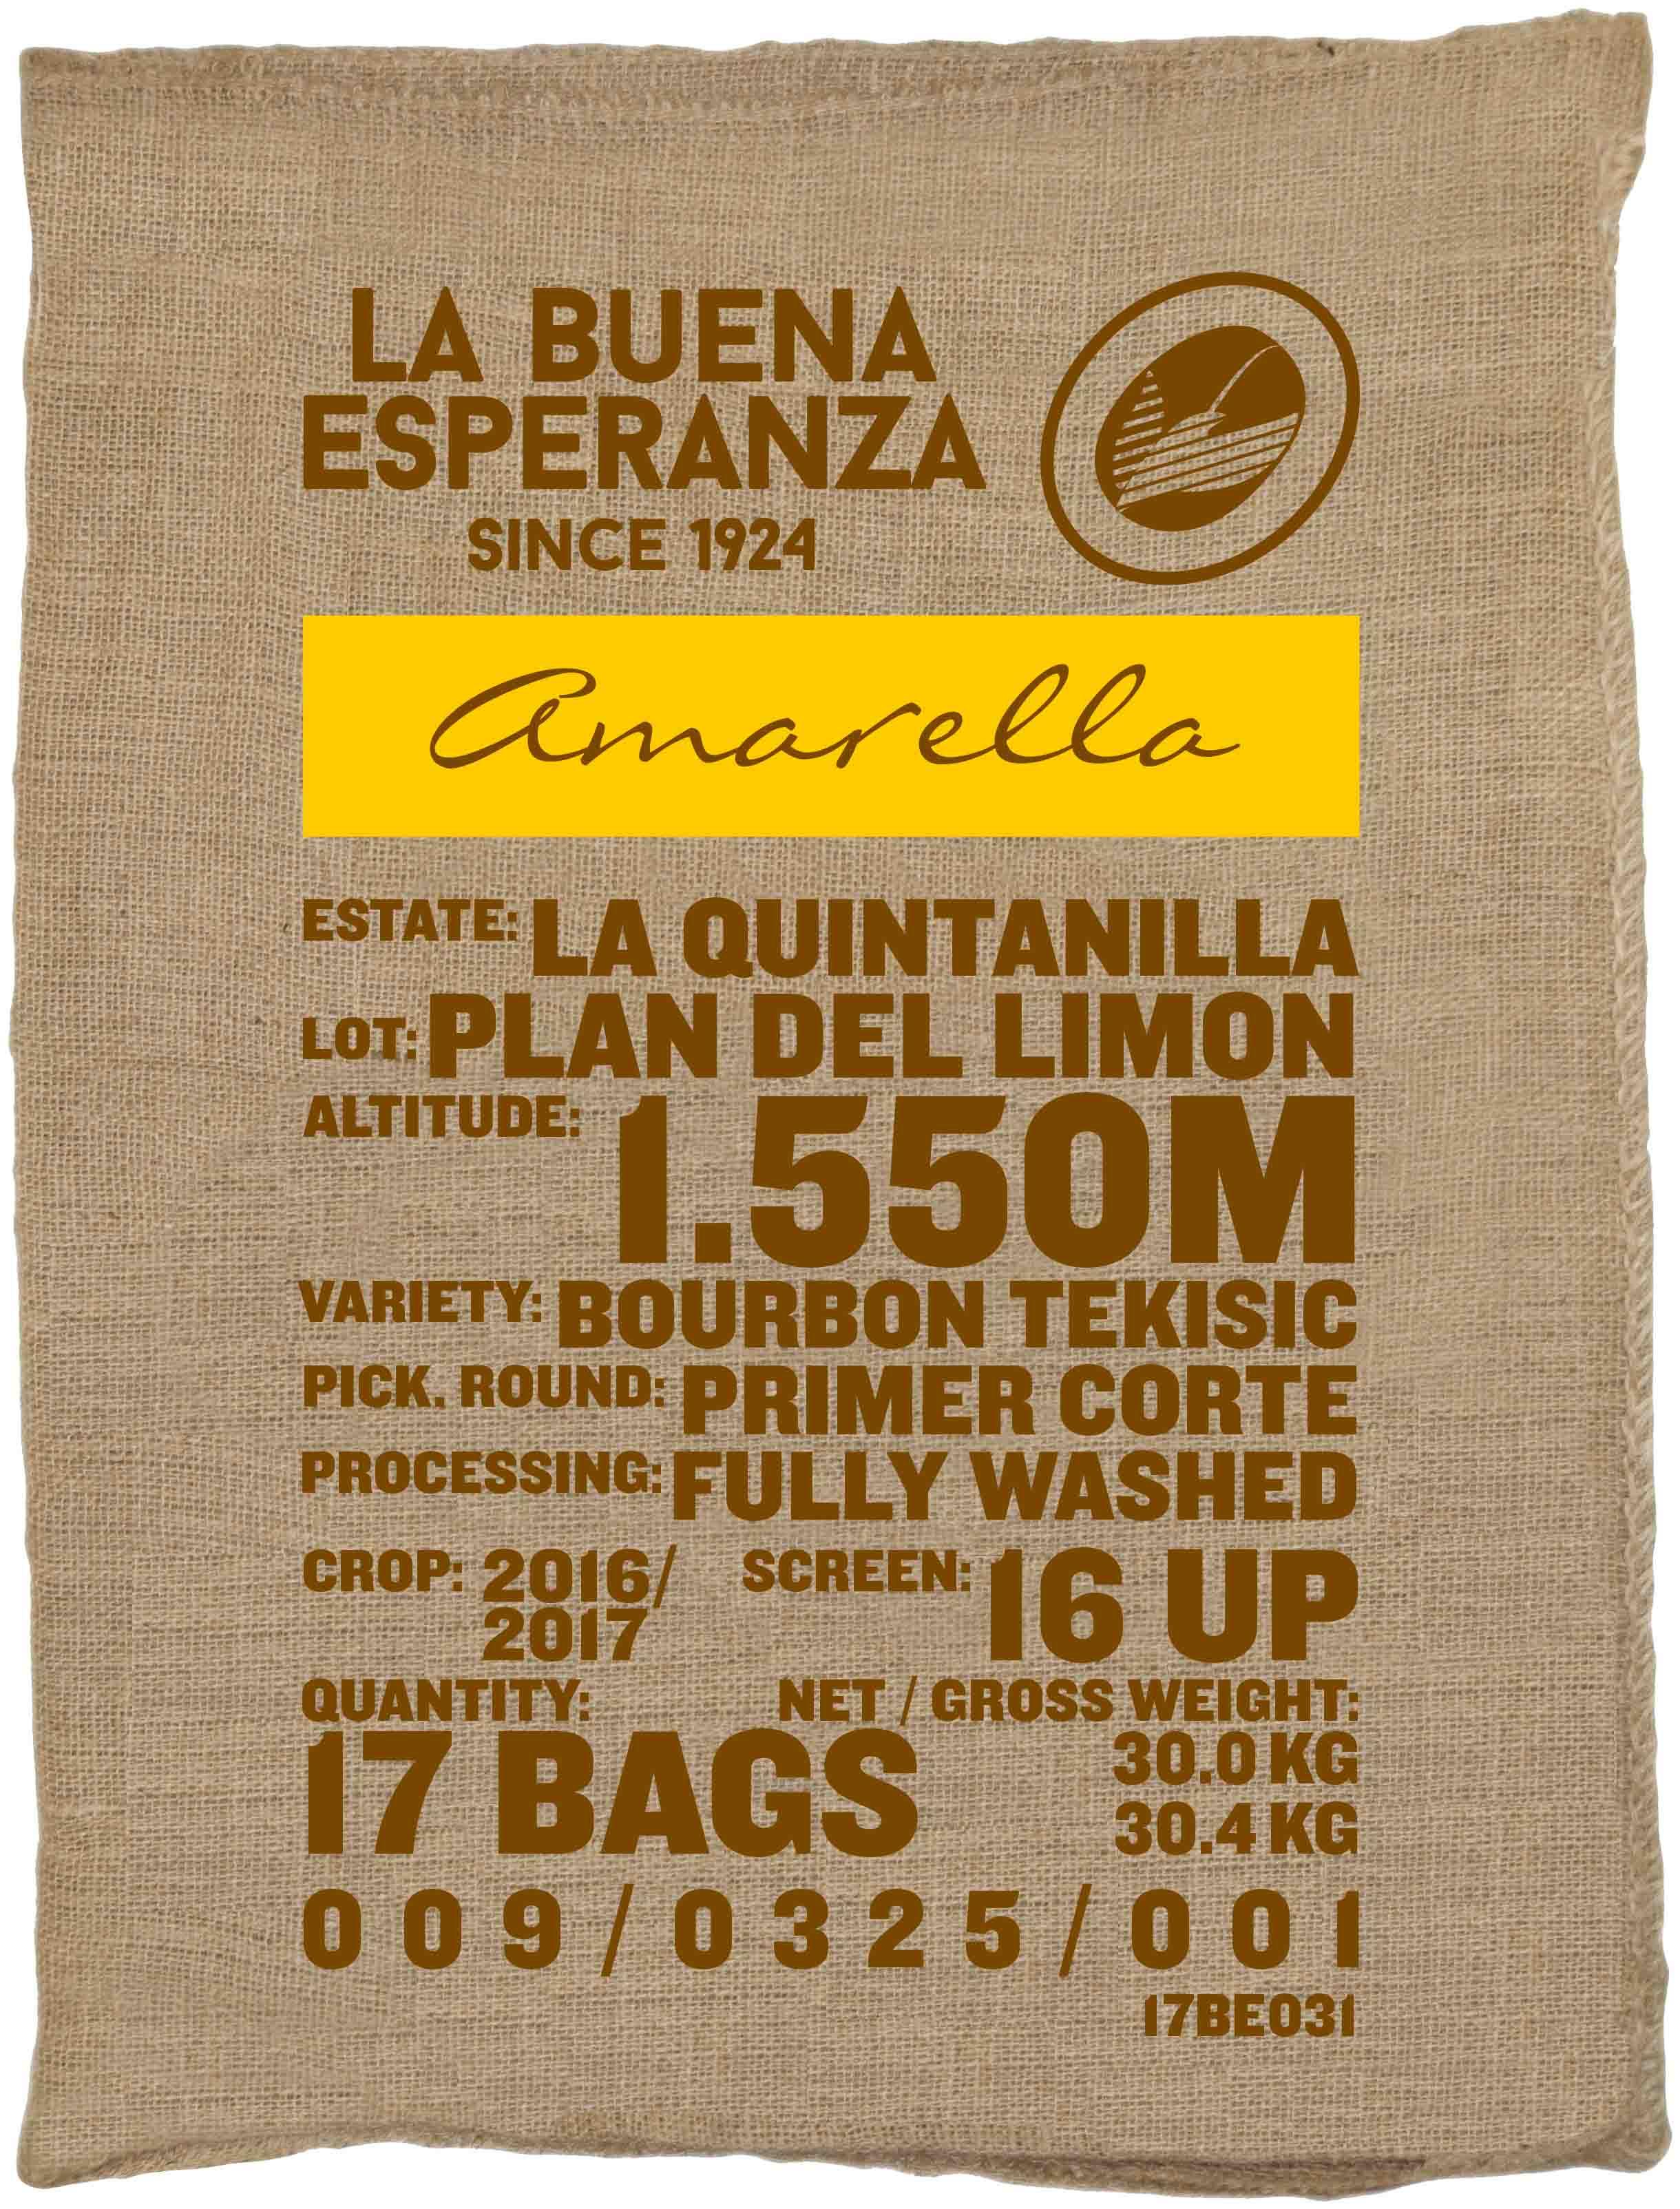 Ein Rohkaffeesack amarella Parzellenkaffee Varietät Bourbon Tekisic. Finca La Buena Esperanza Lot Plan del Limon.